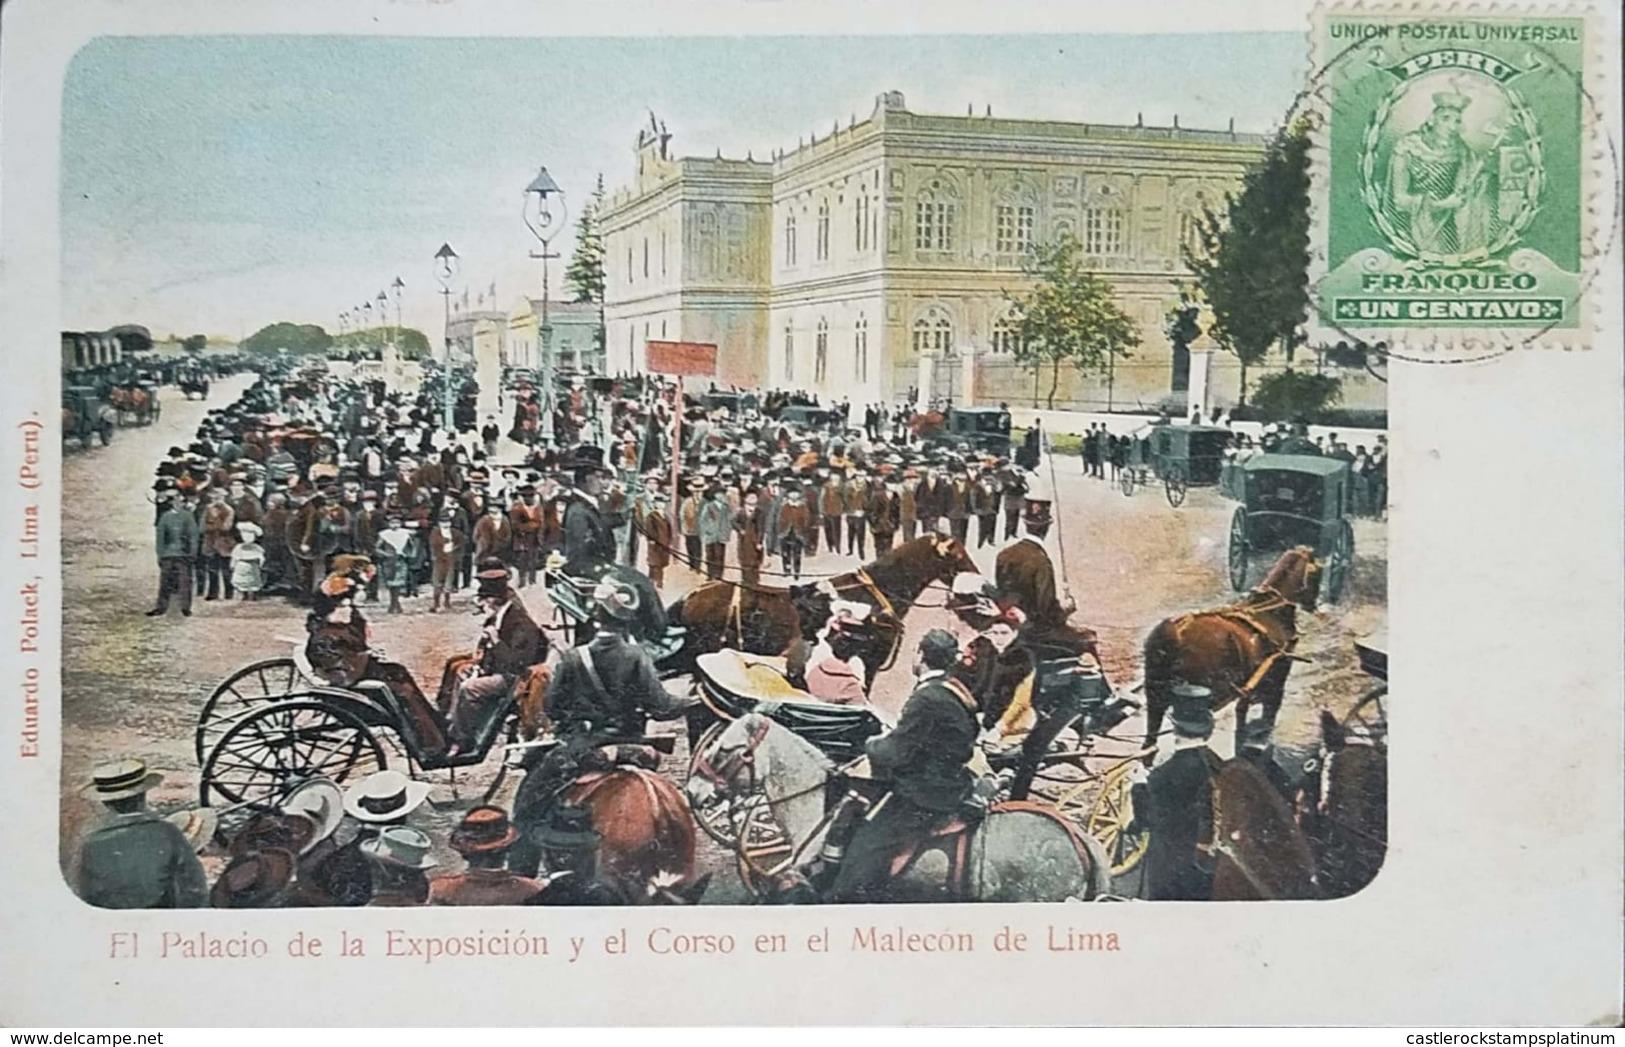 O) 1900 CIRCA - PERU, STAMP MANCO CAPAC -FOUNDER OF INCA DYNASTY SCT 142 FRANQUEO  1c  Green, THE PALACE OF THE EXHIBITI - Peru